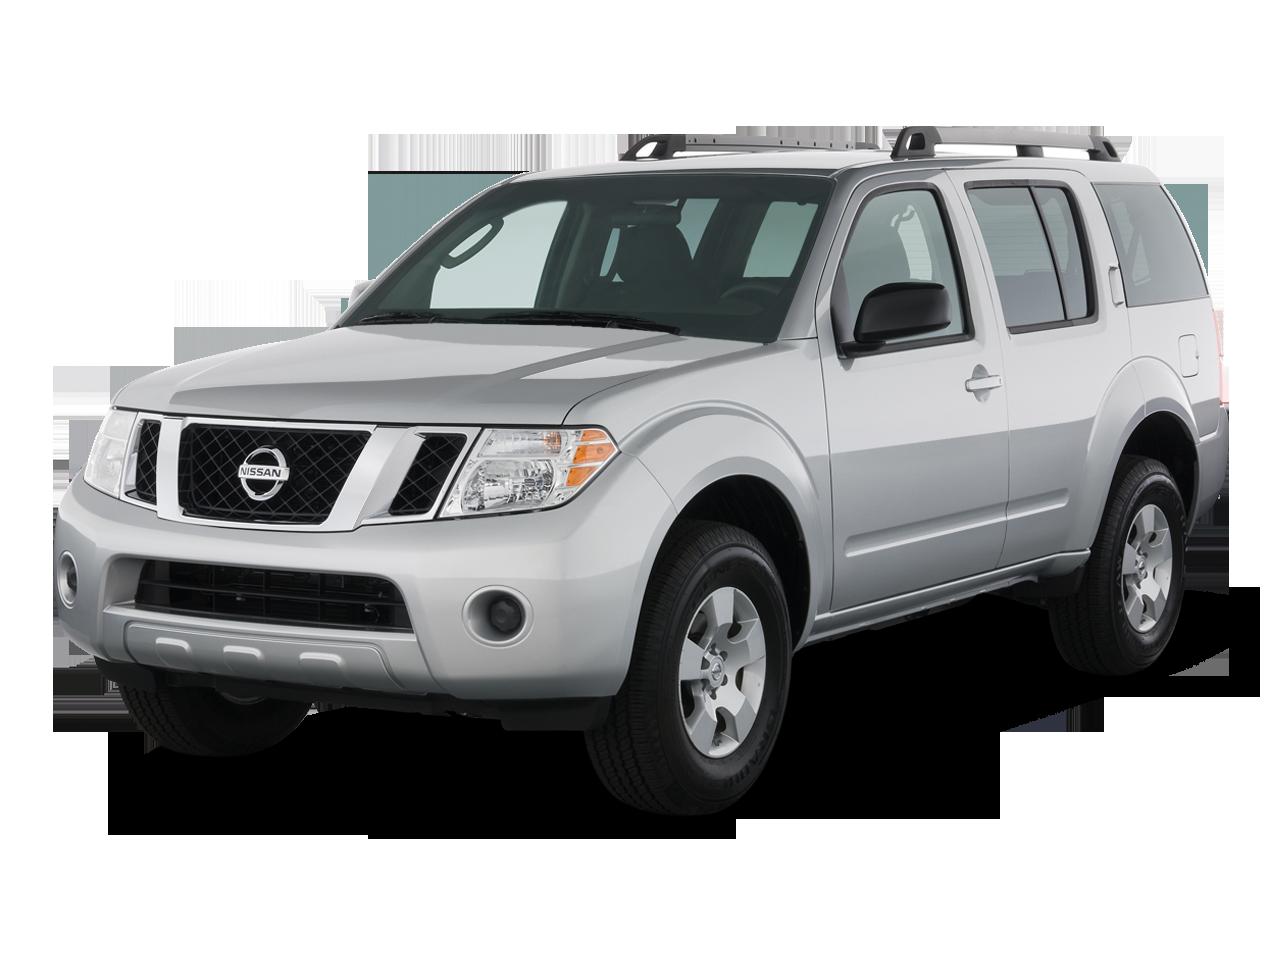 Nissan Pathfinder Specs >> 2008 Nissan Pathfinder SE - Nissan Midsize SUV Review - Automobile Magazine